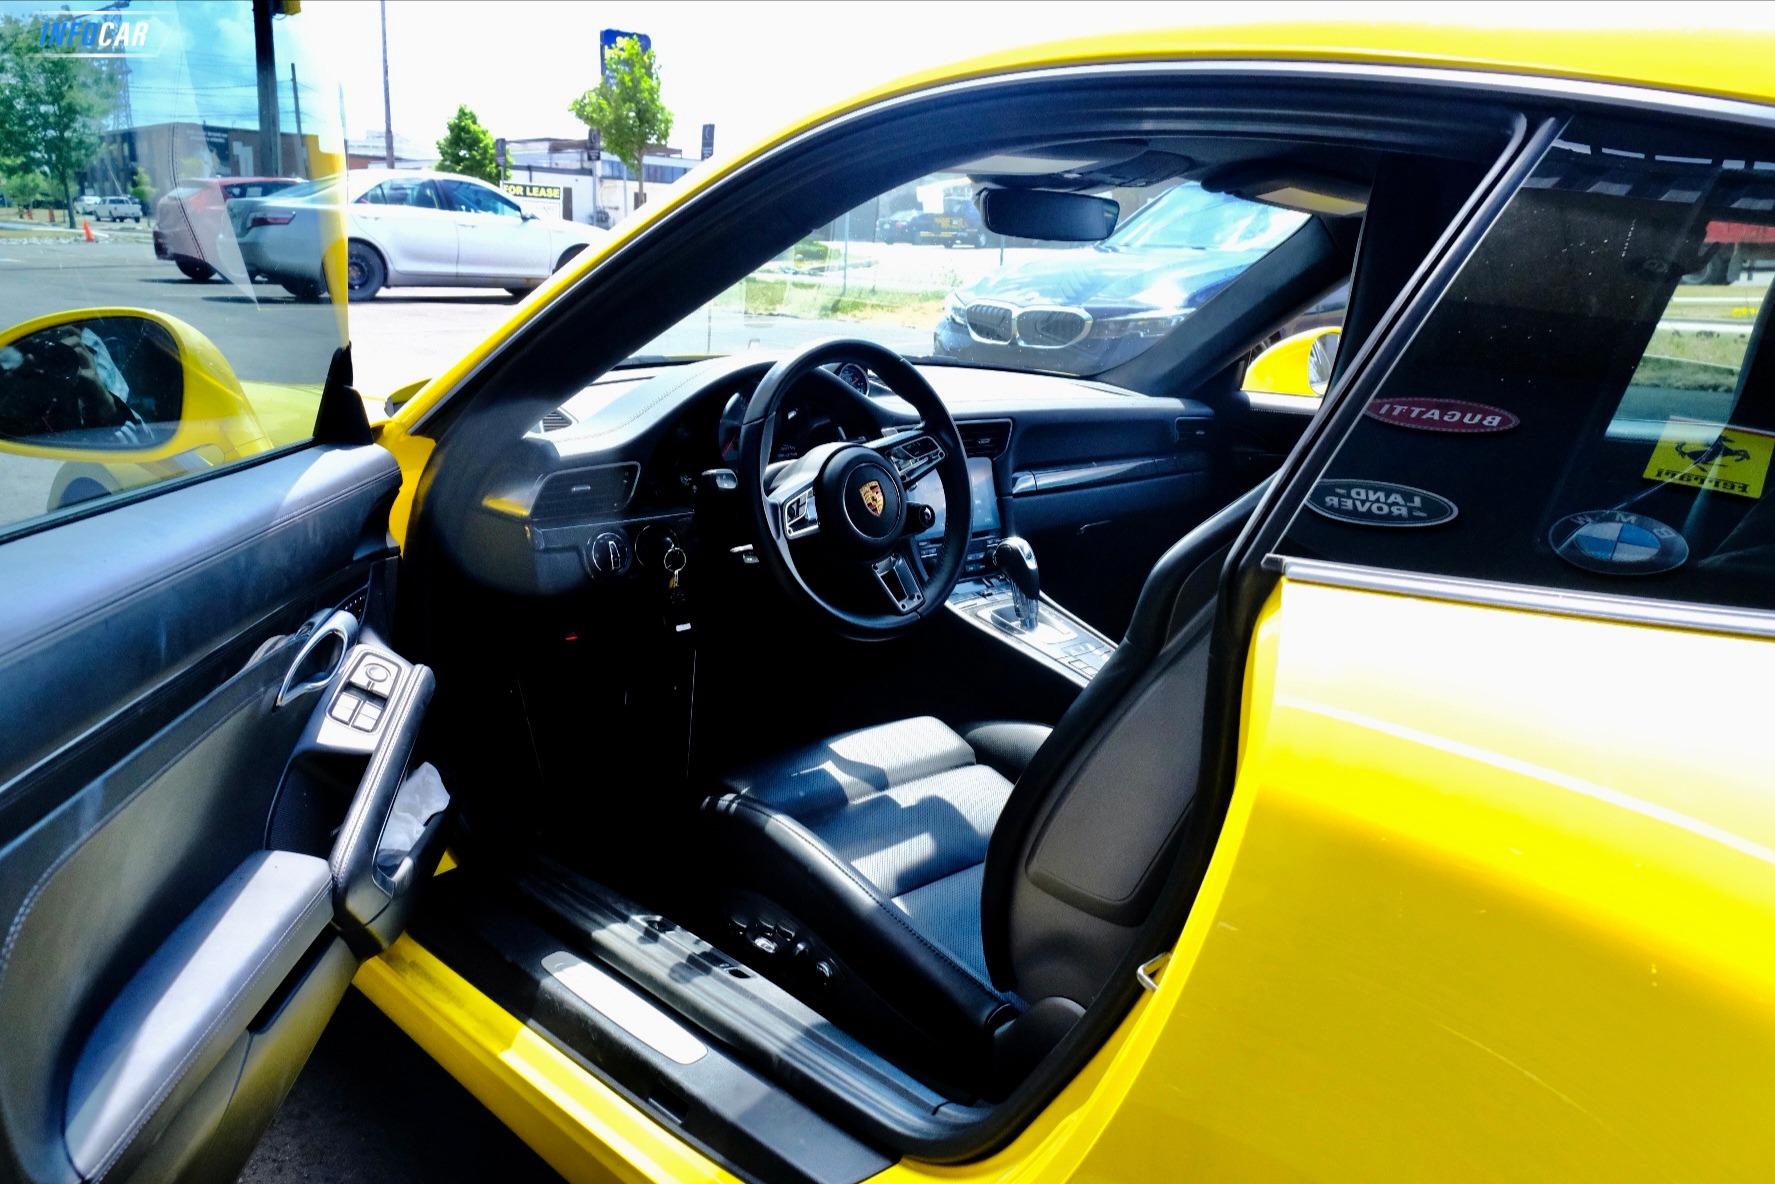 2018 Porsche 911 Carrera S - INFOCAR - Toronto's Most Comprehensive New and Used Auto Trading Platform